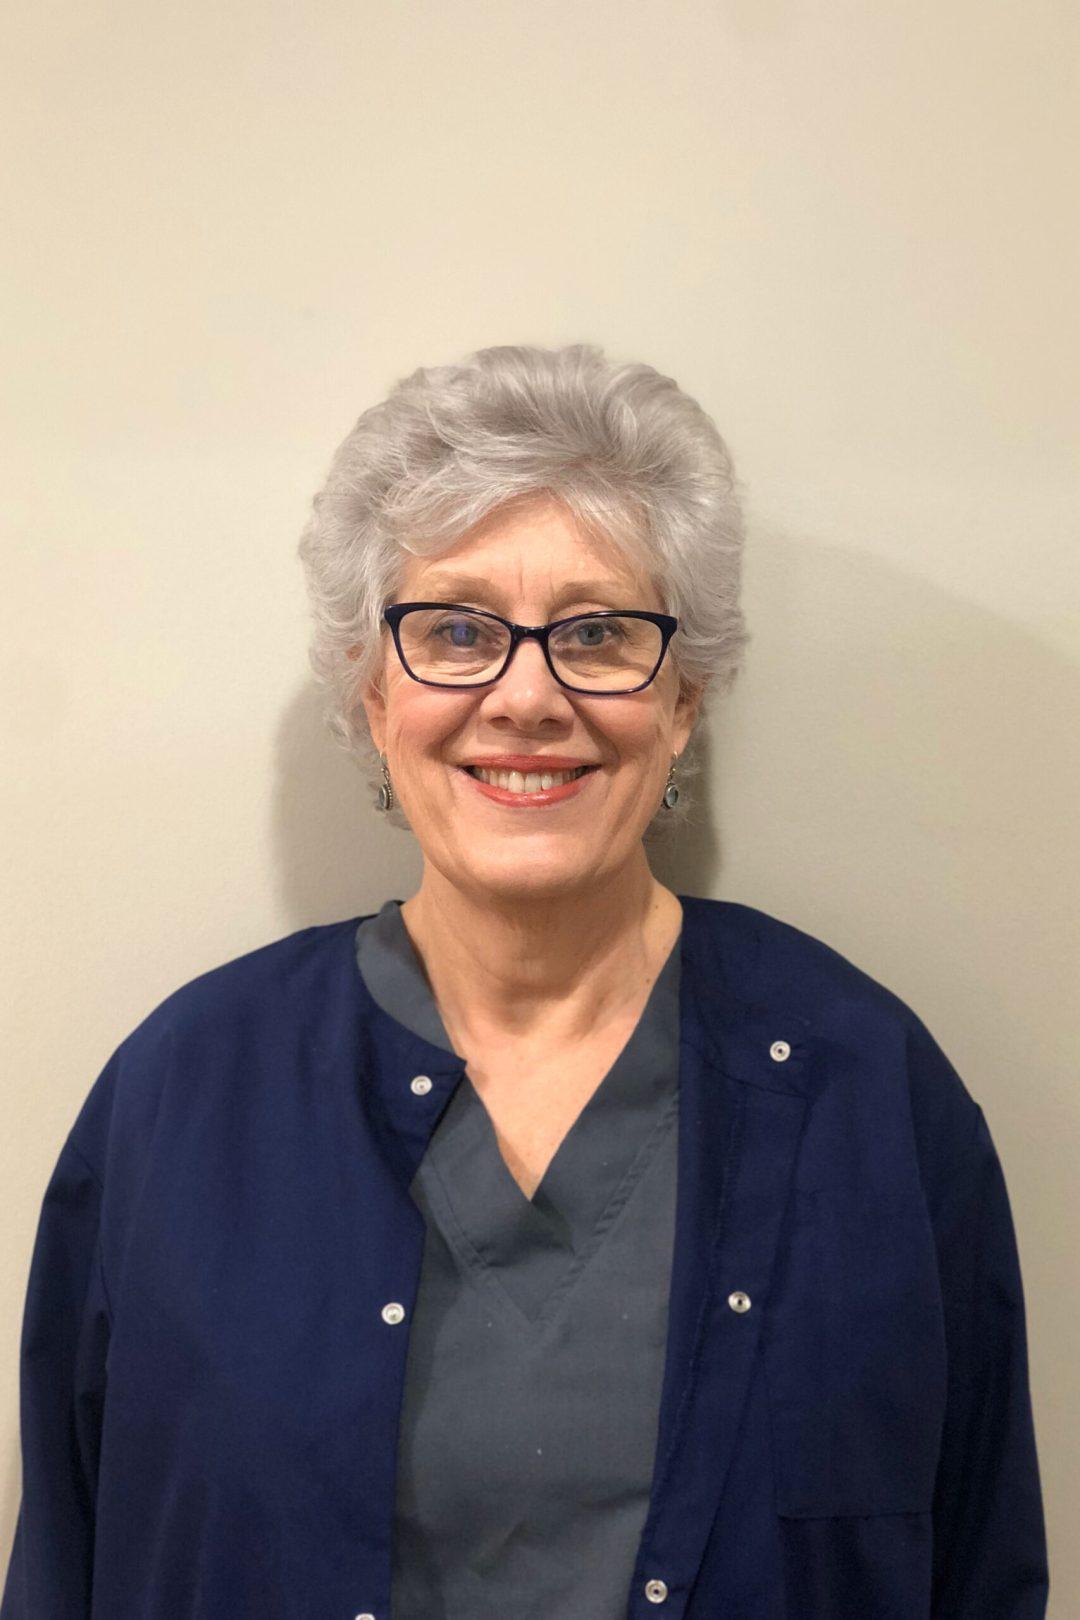 Theresa Bartolotta, PhD, CCC-SLP